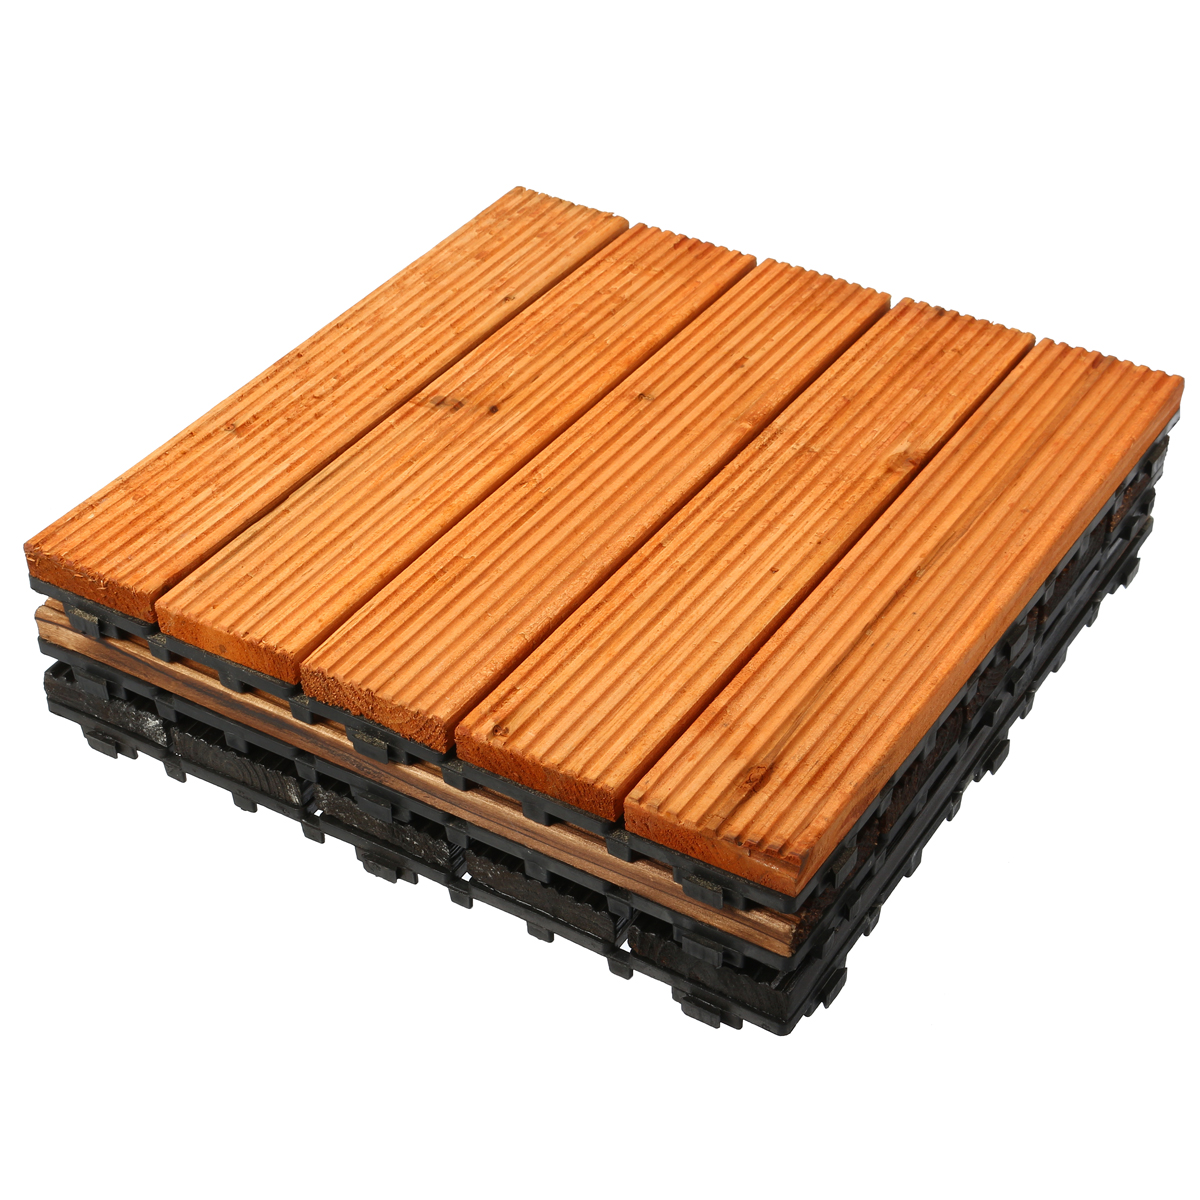 30x30cm DIY Wood Patio Interlocking Flooring Decking Tile ...